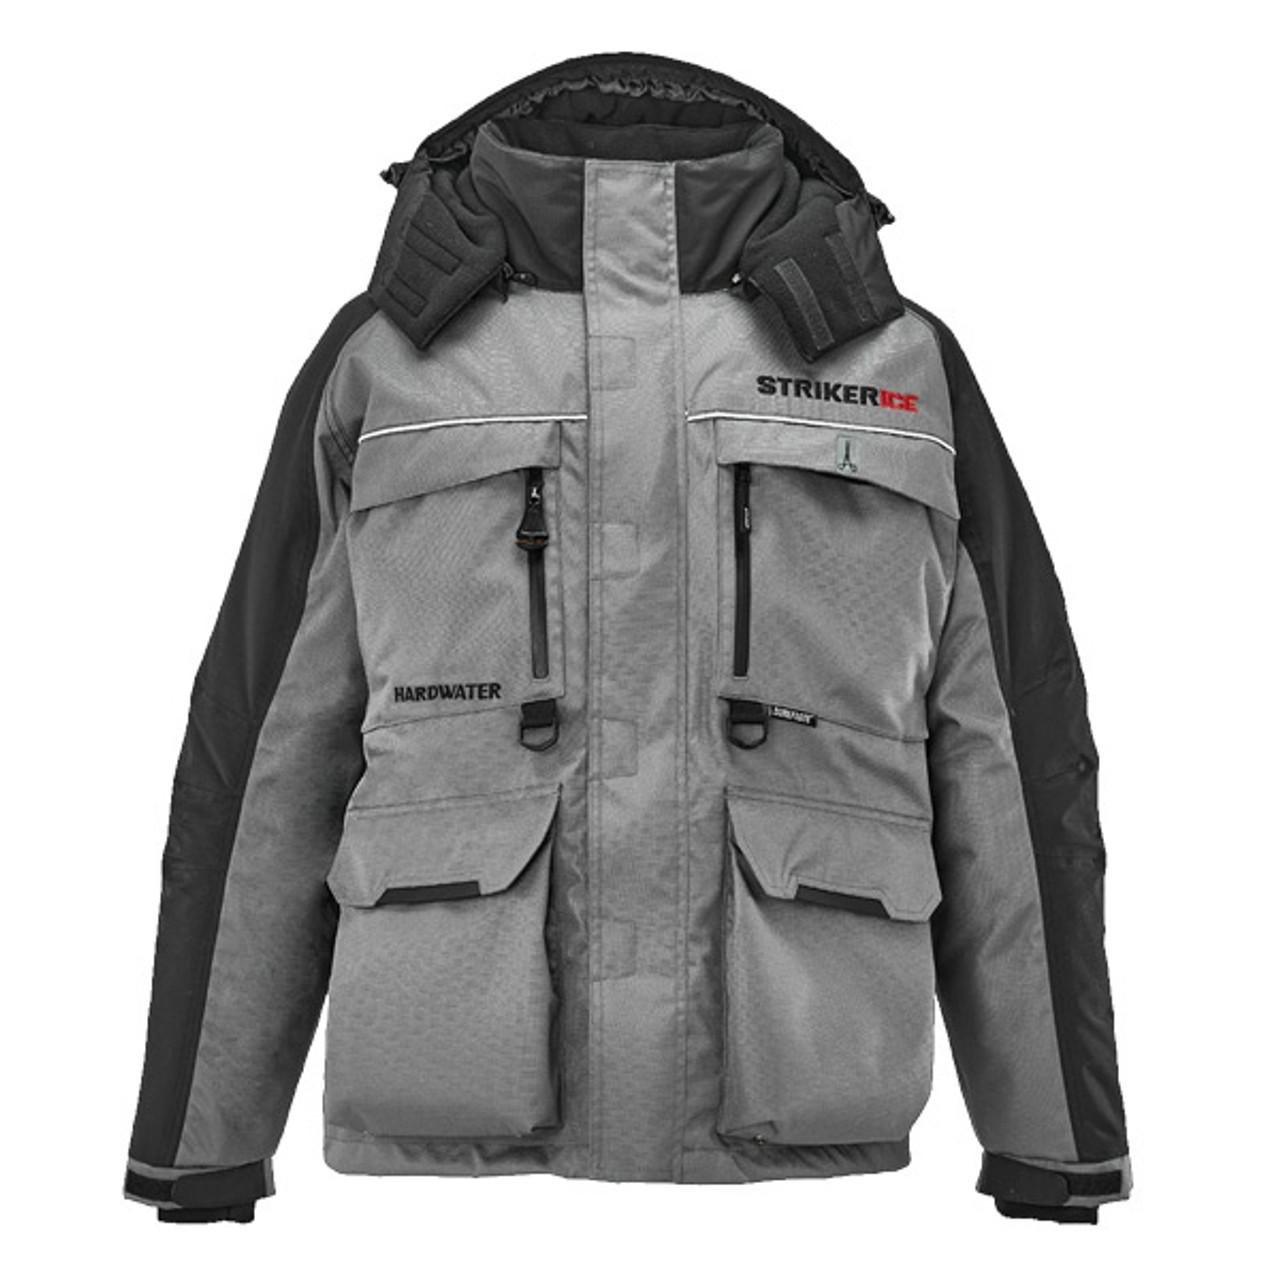 New 2020 Black/Gray Striker Ice Floating HardWater Jacket